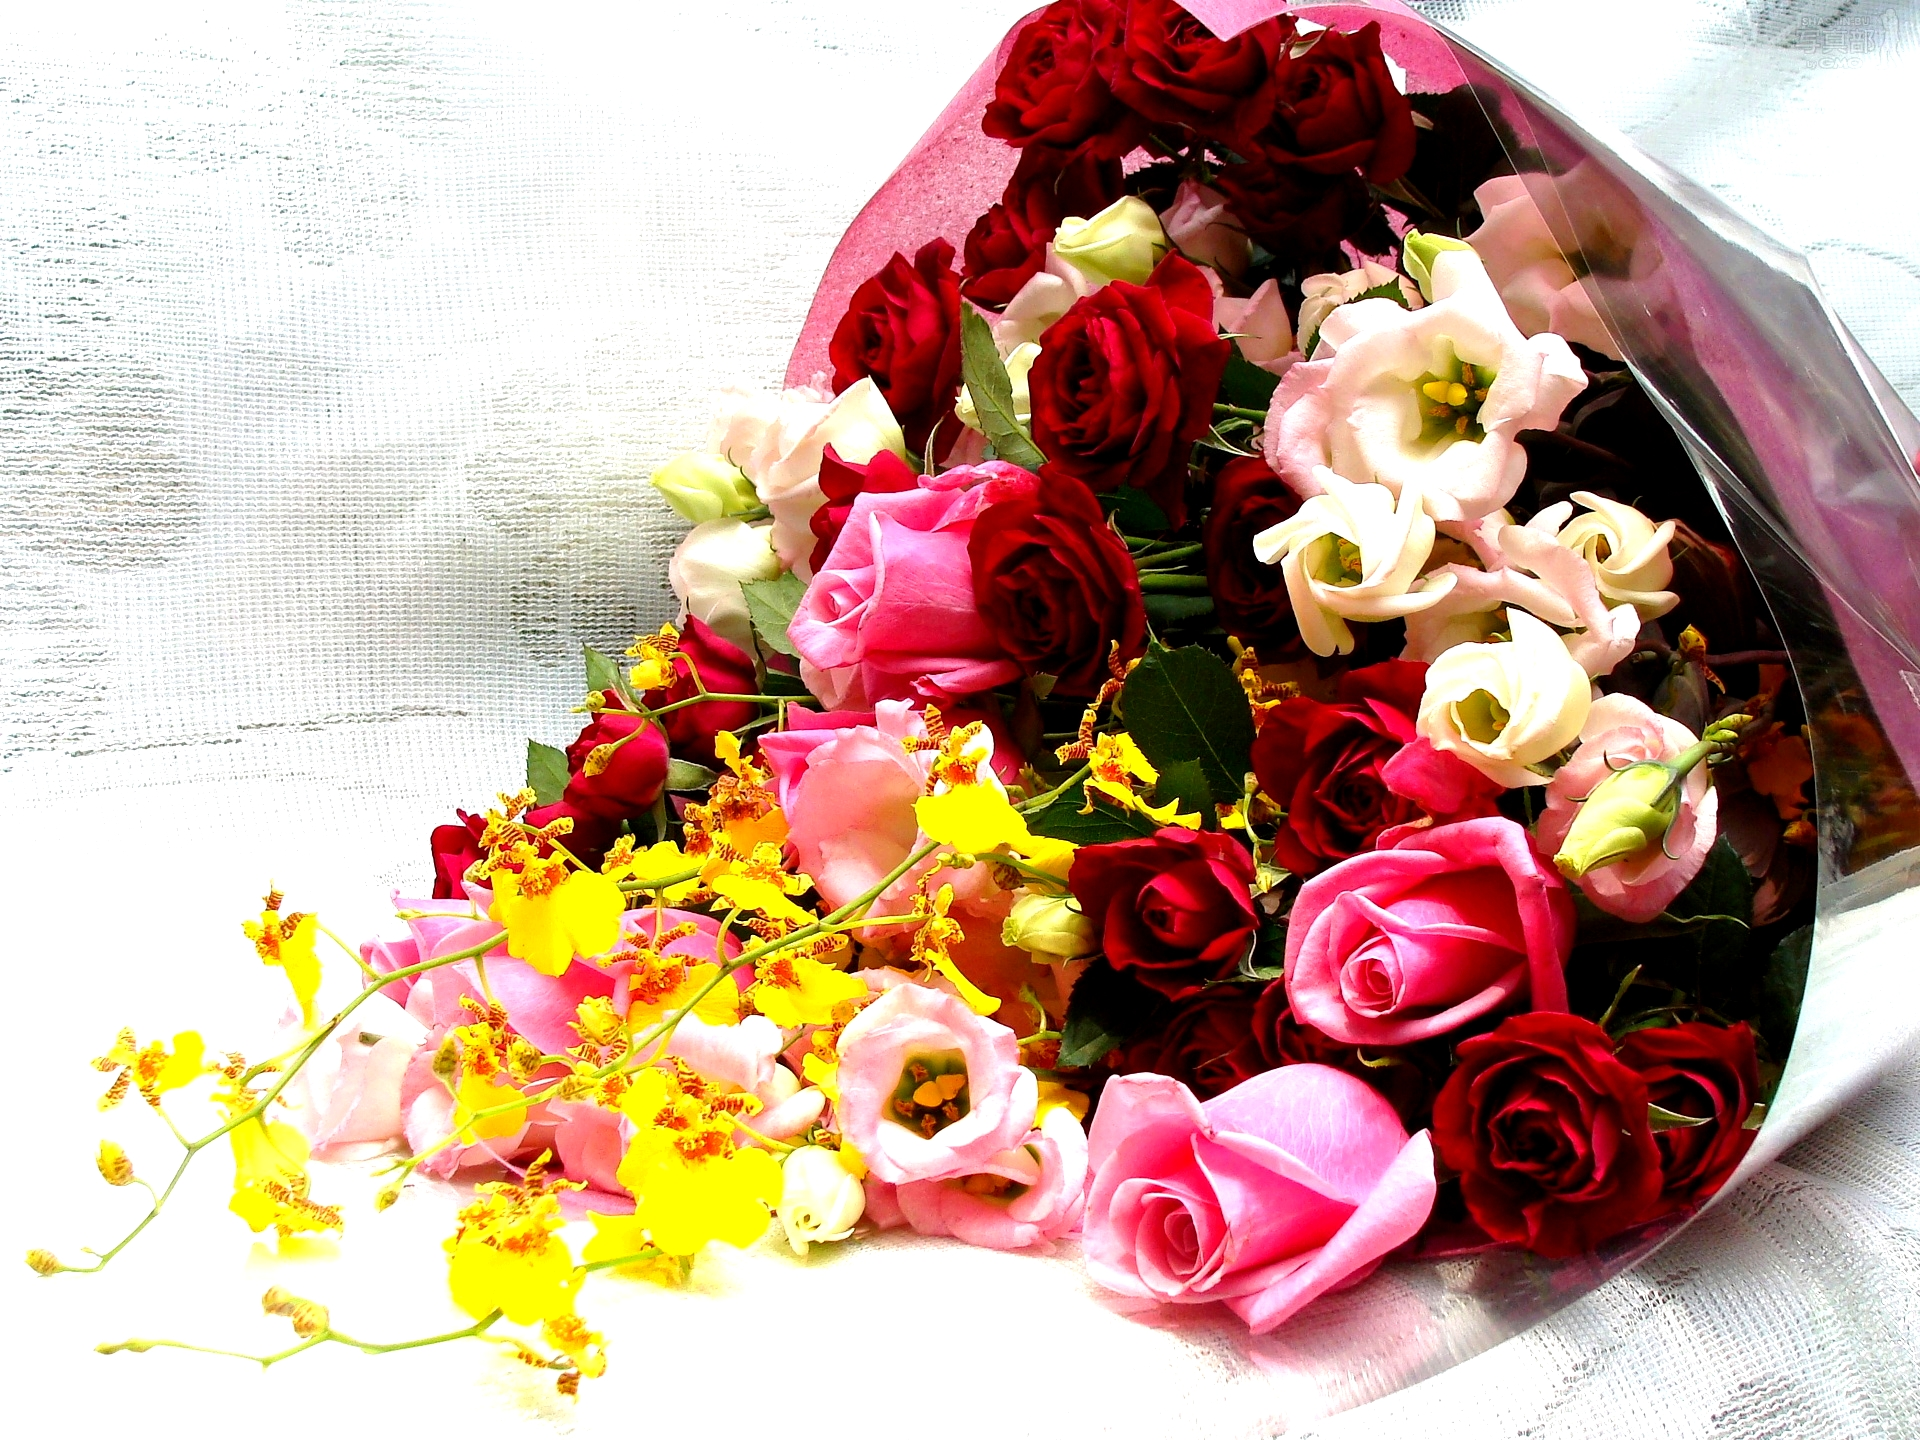 Bouquet Flowers Wallpaper 1920x1440 78134